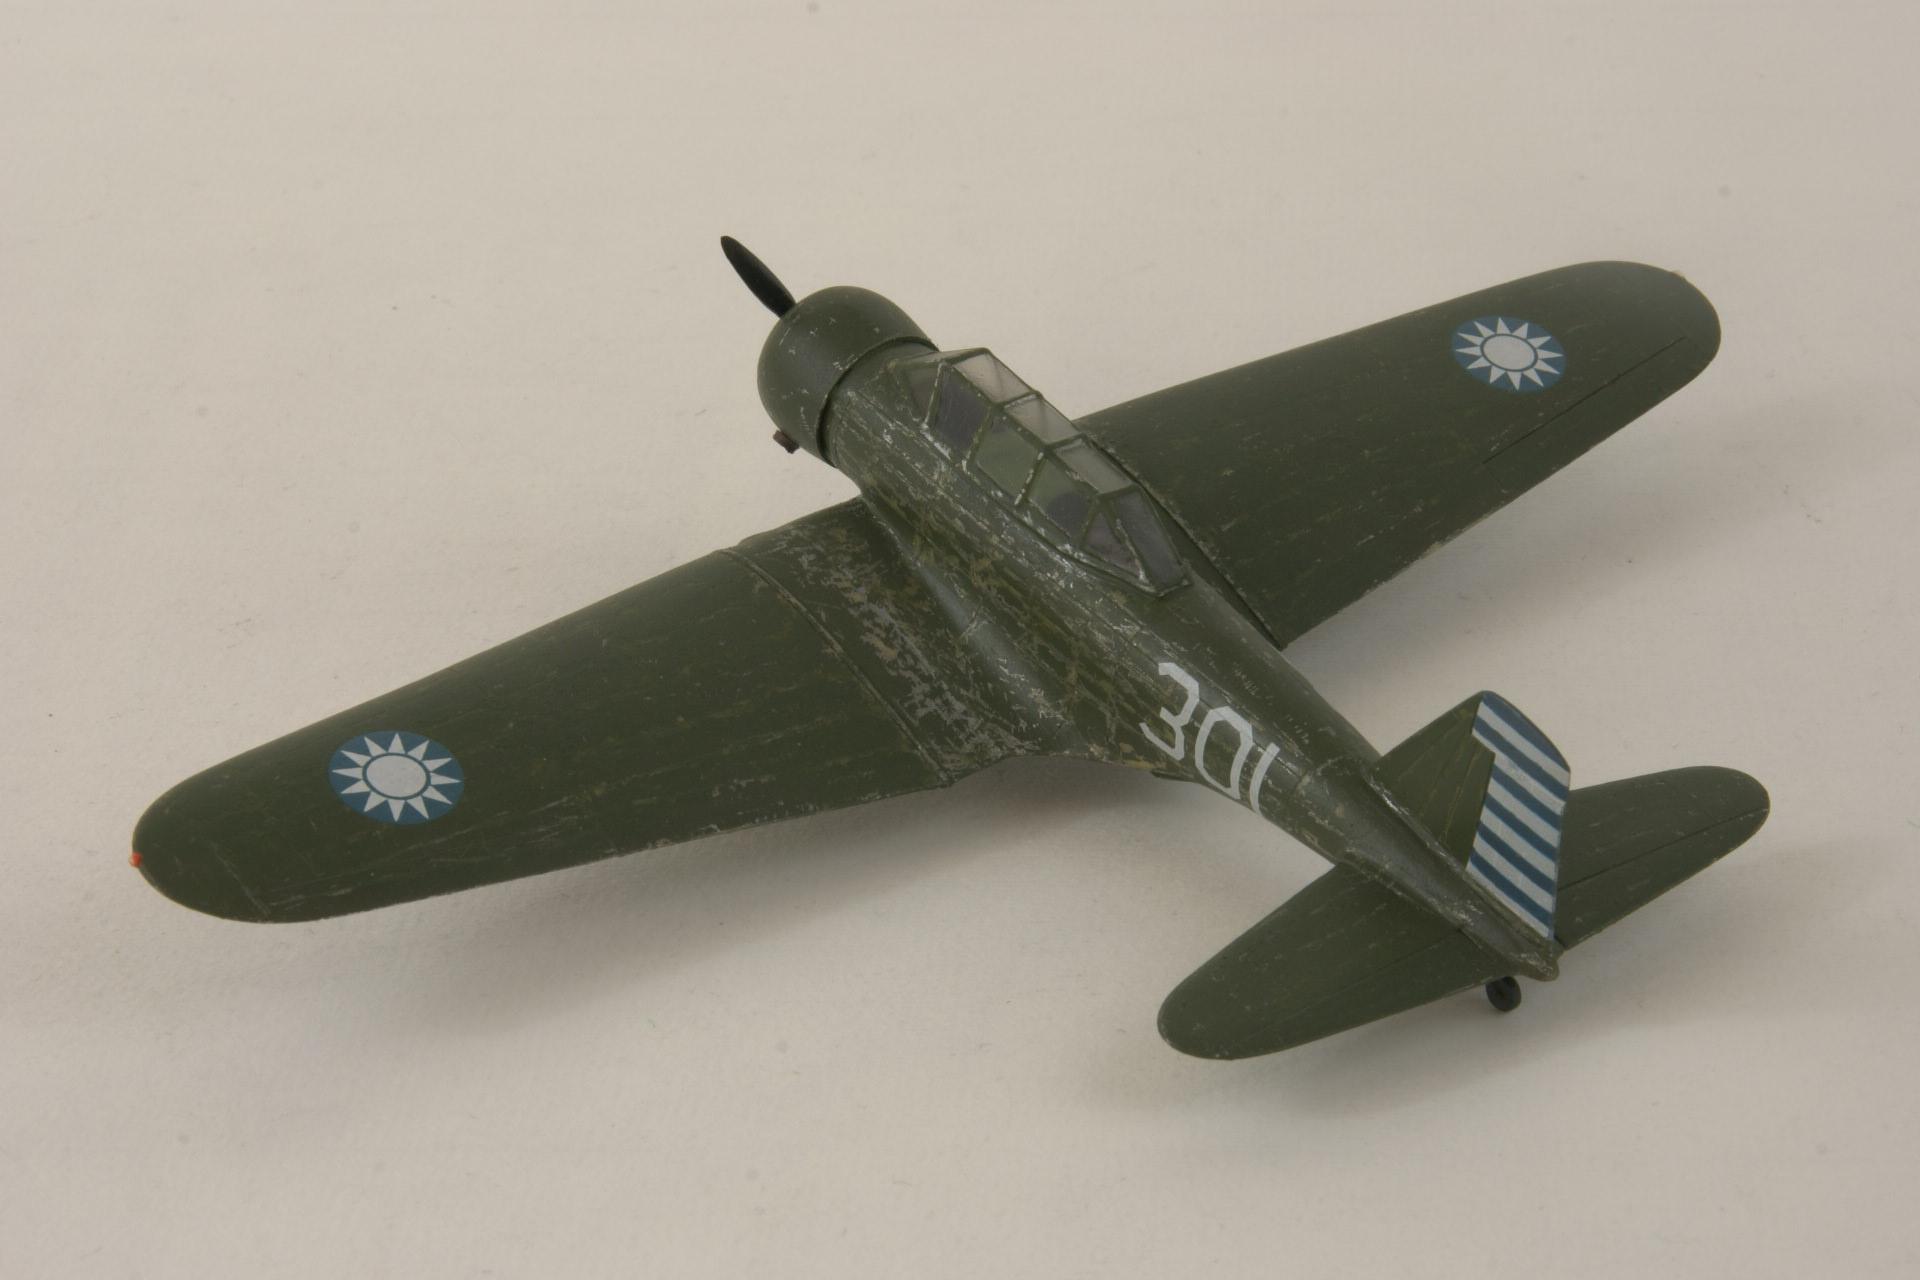 Northrop gamma 2e 2 1